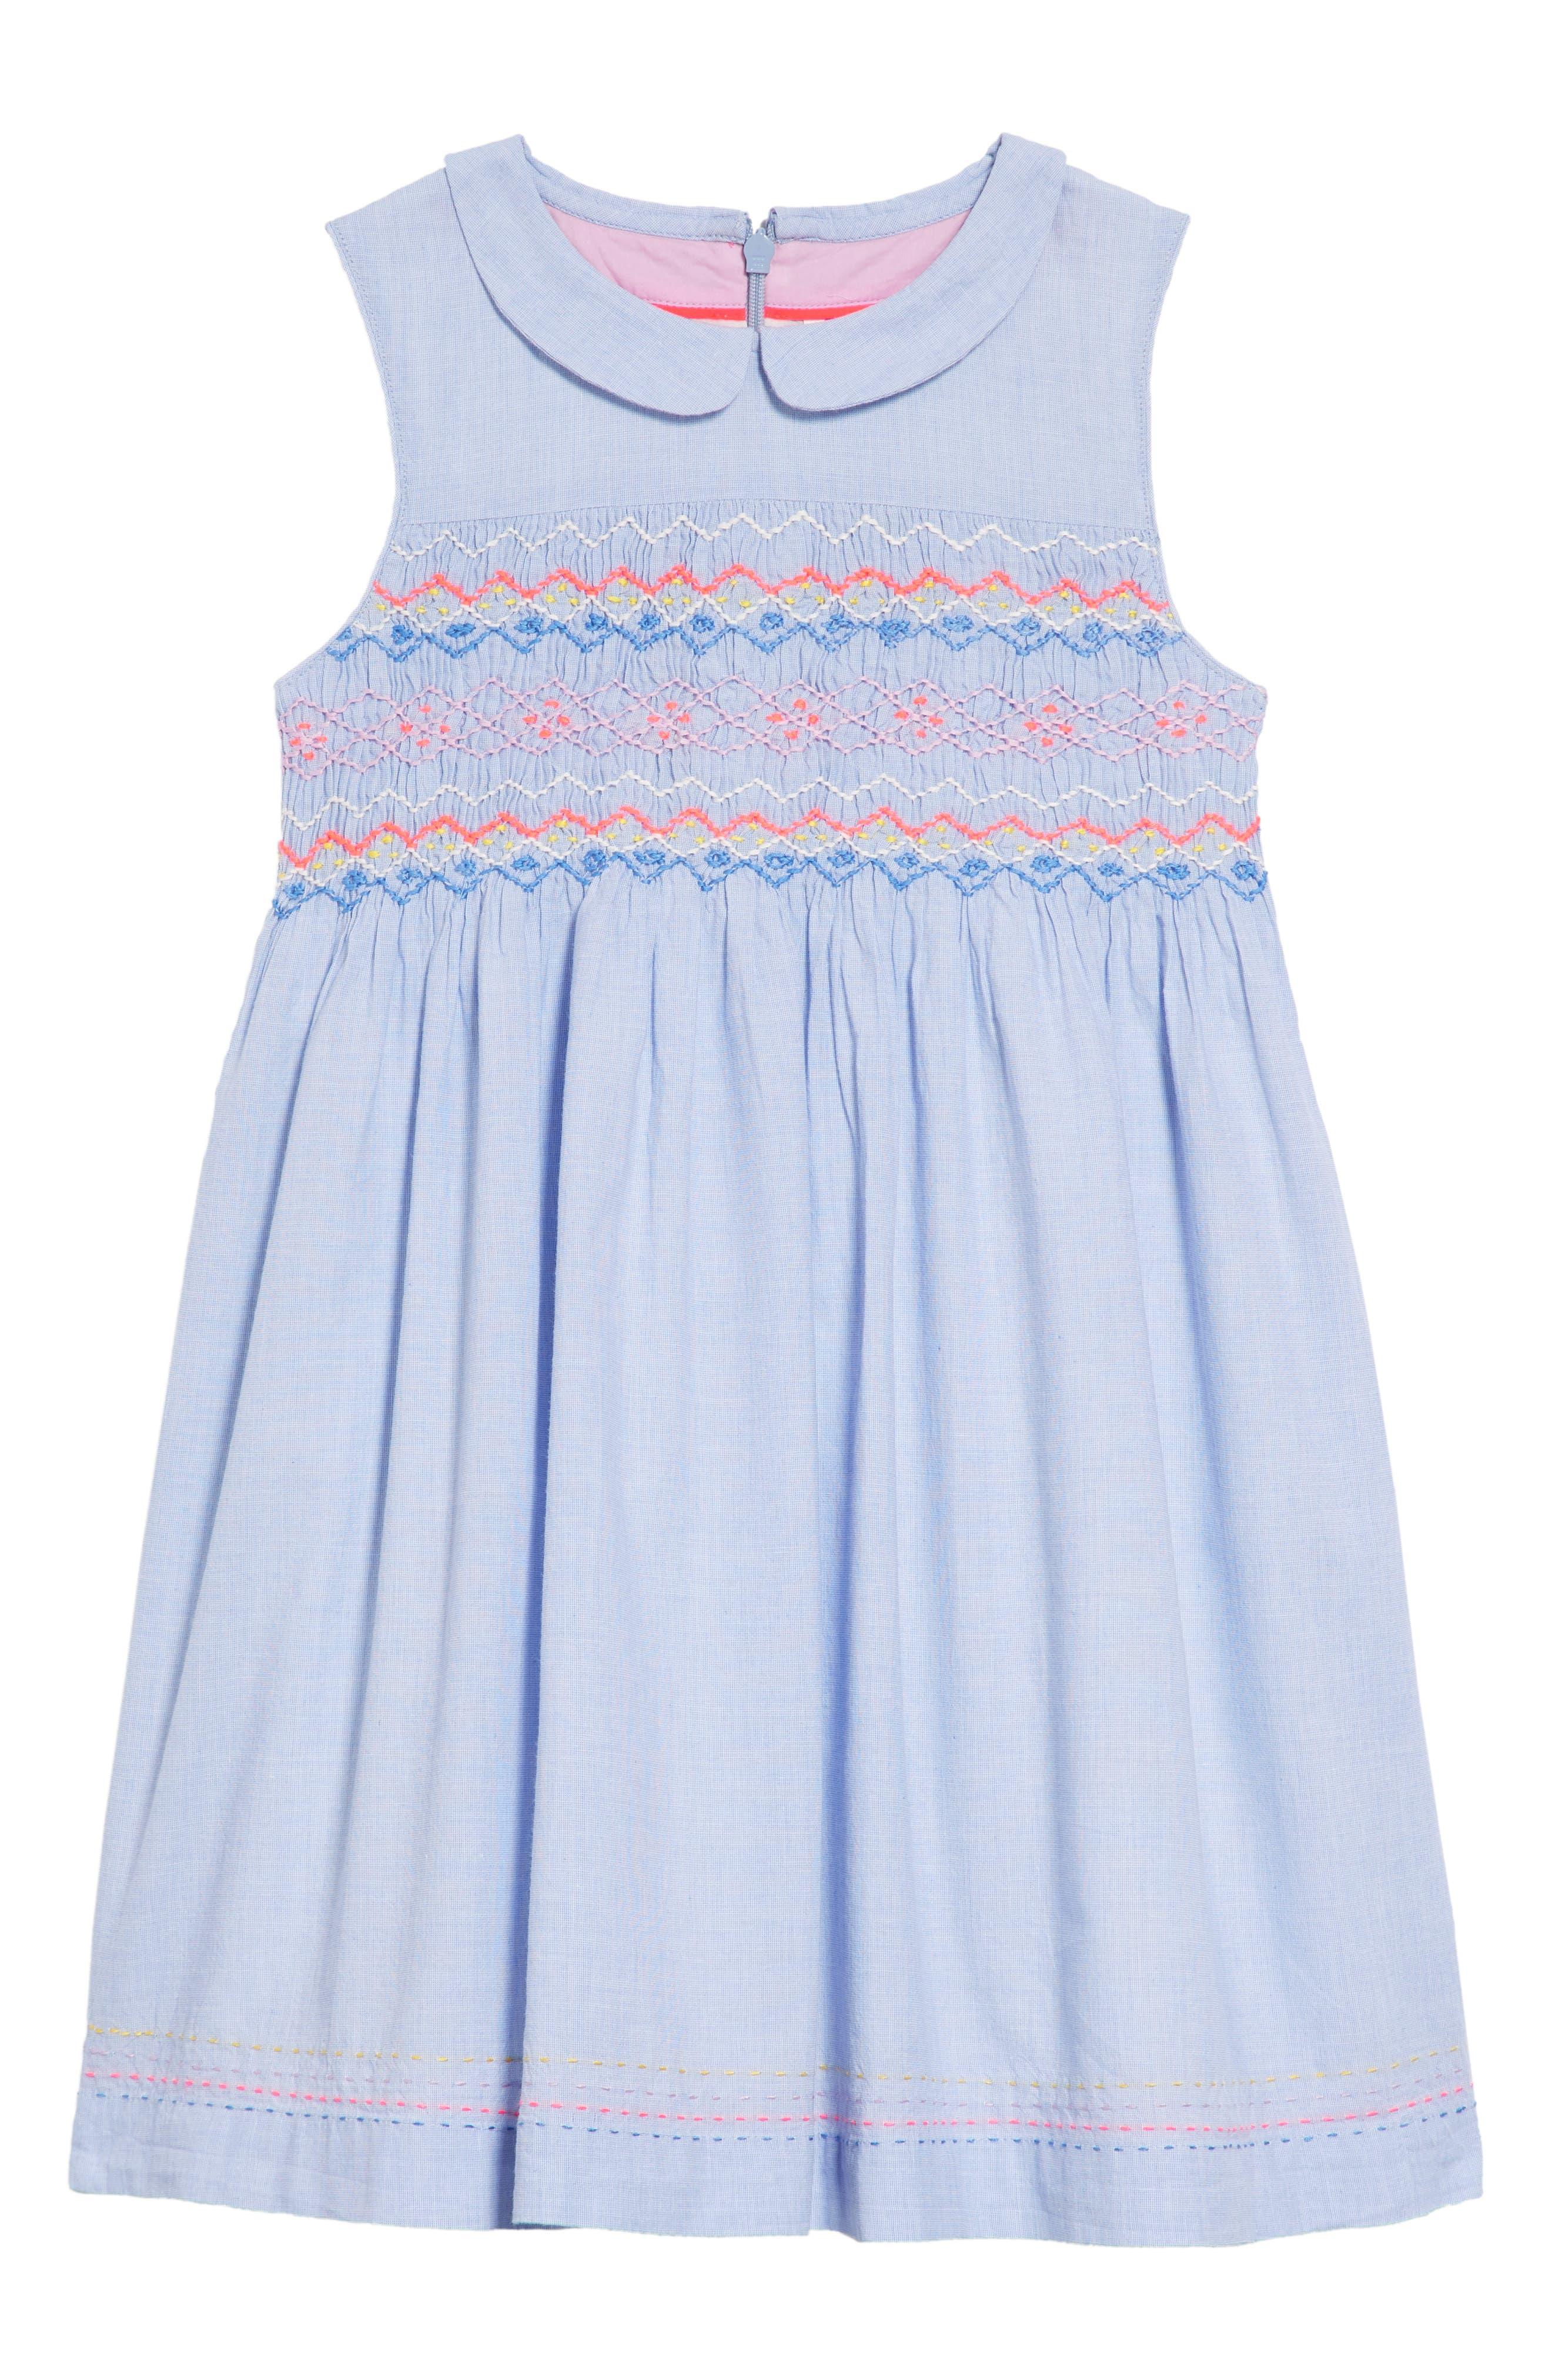 Nostalgic Smocked Dress,                         Main,                         color, Chambray Blue